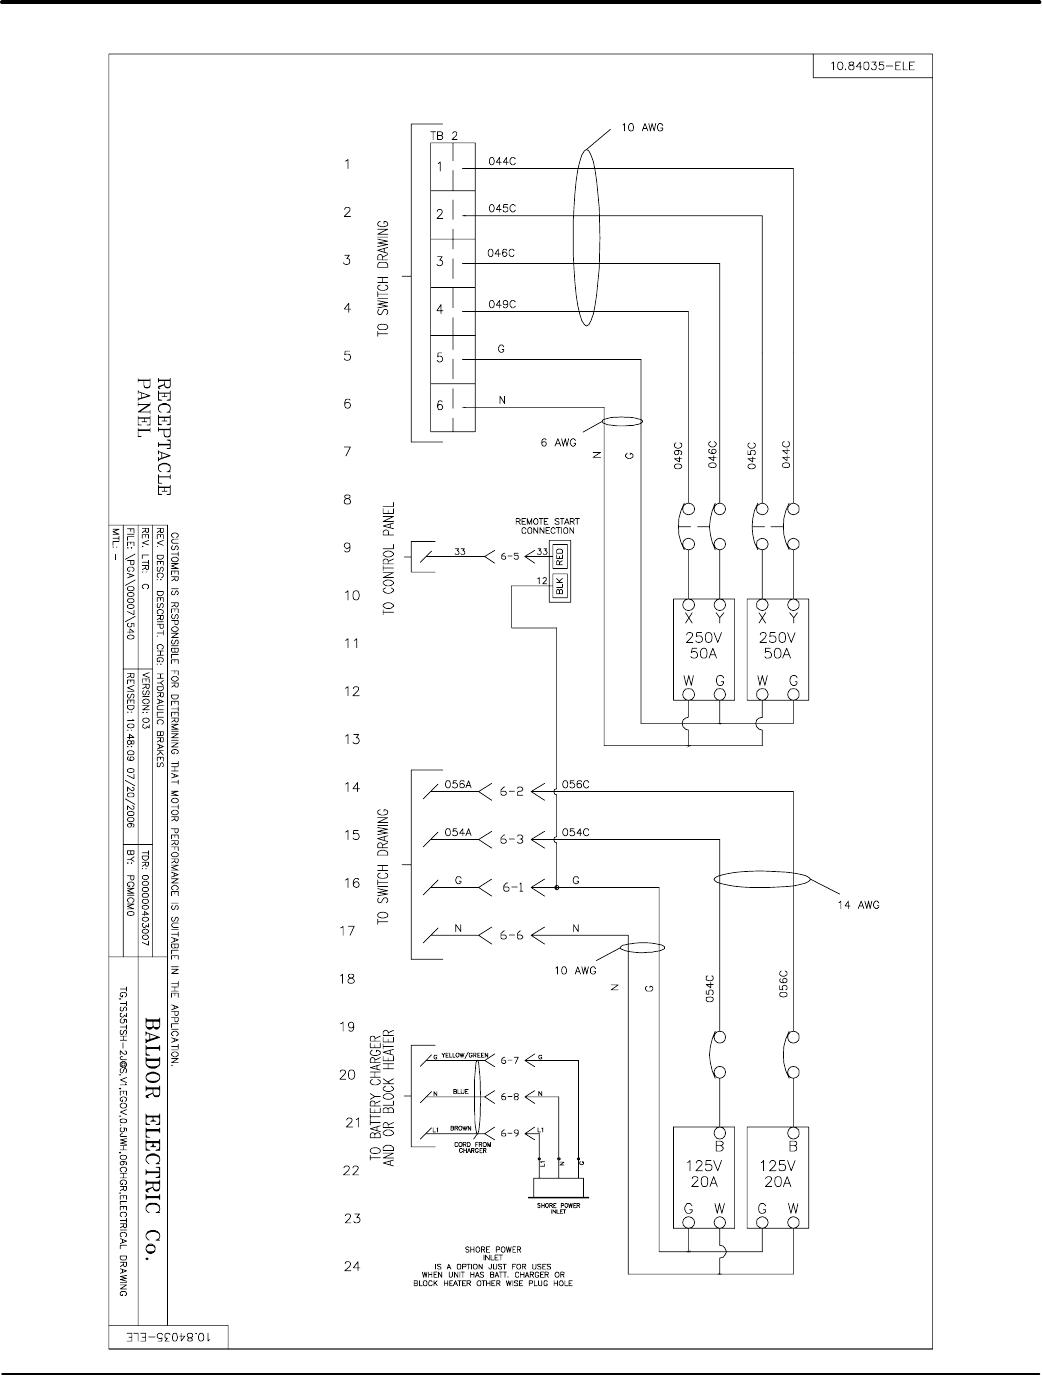 Baldor TS130, TS175, TS25, TS250, TS35, TS400, TS45, TS60